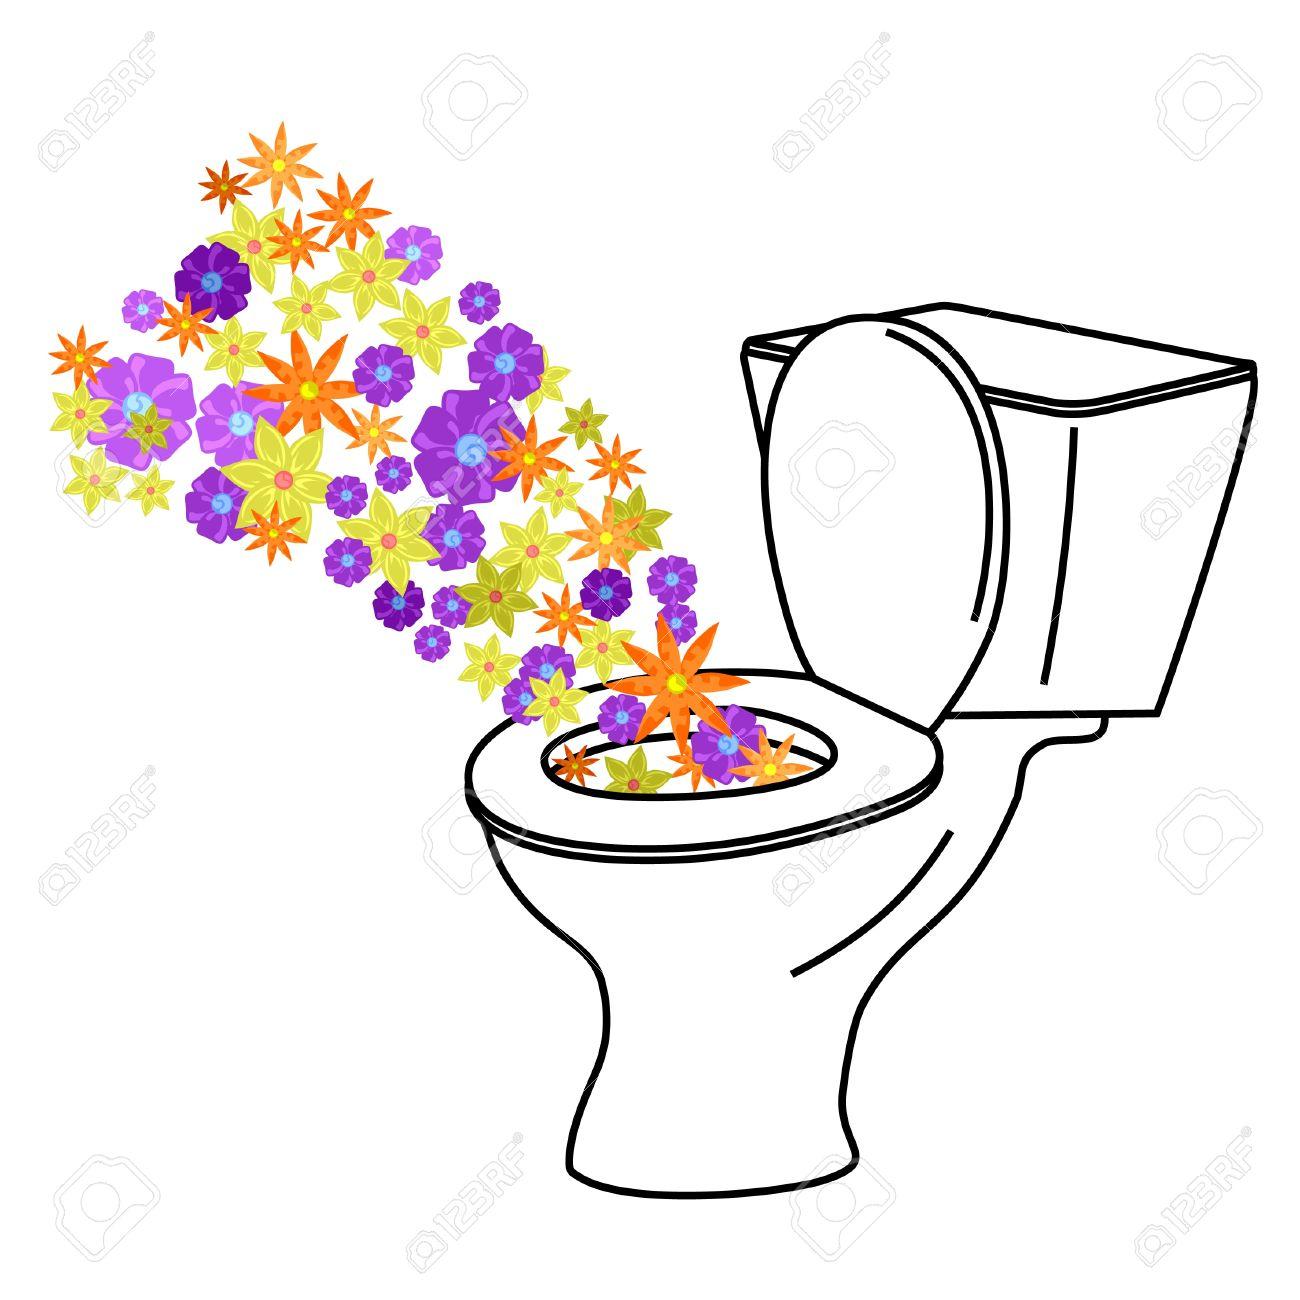 Bathroom Cabinet Clip Art: Free Download Best Clean Toilet